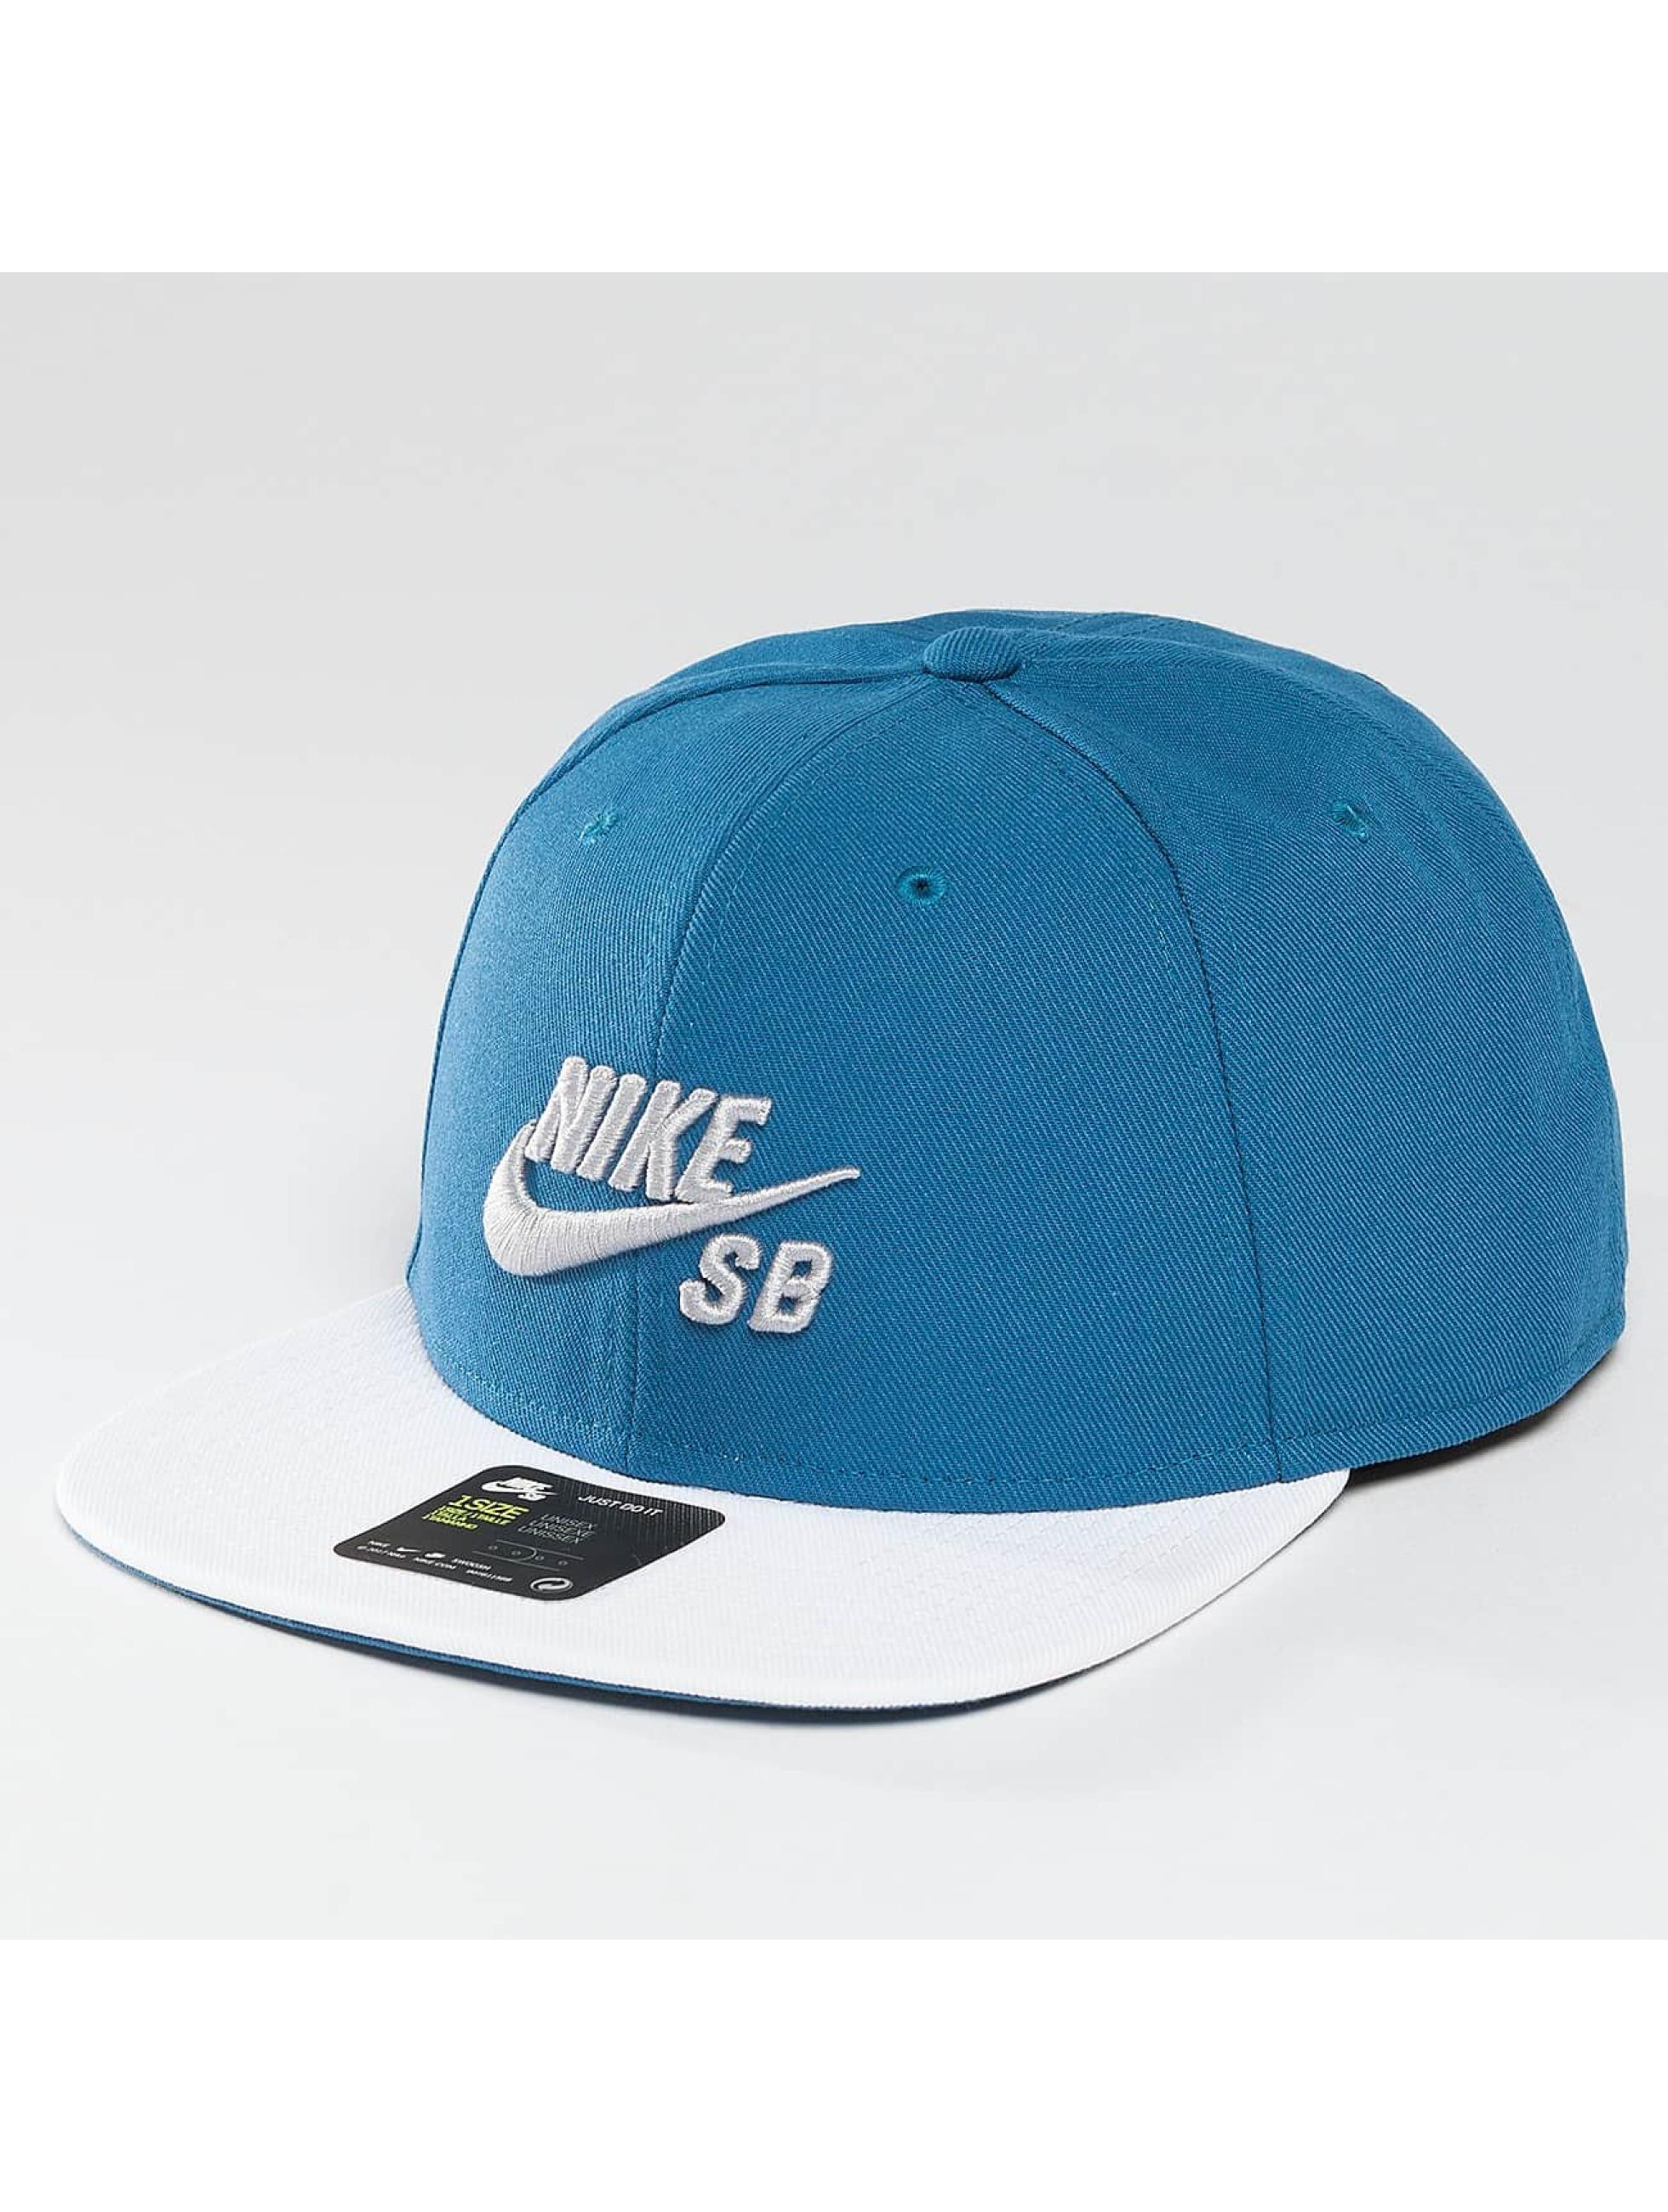 nike sb herren snapback cap icon in blau 306274. Black Bedroom Furniture Sets. Home Design Ideas